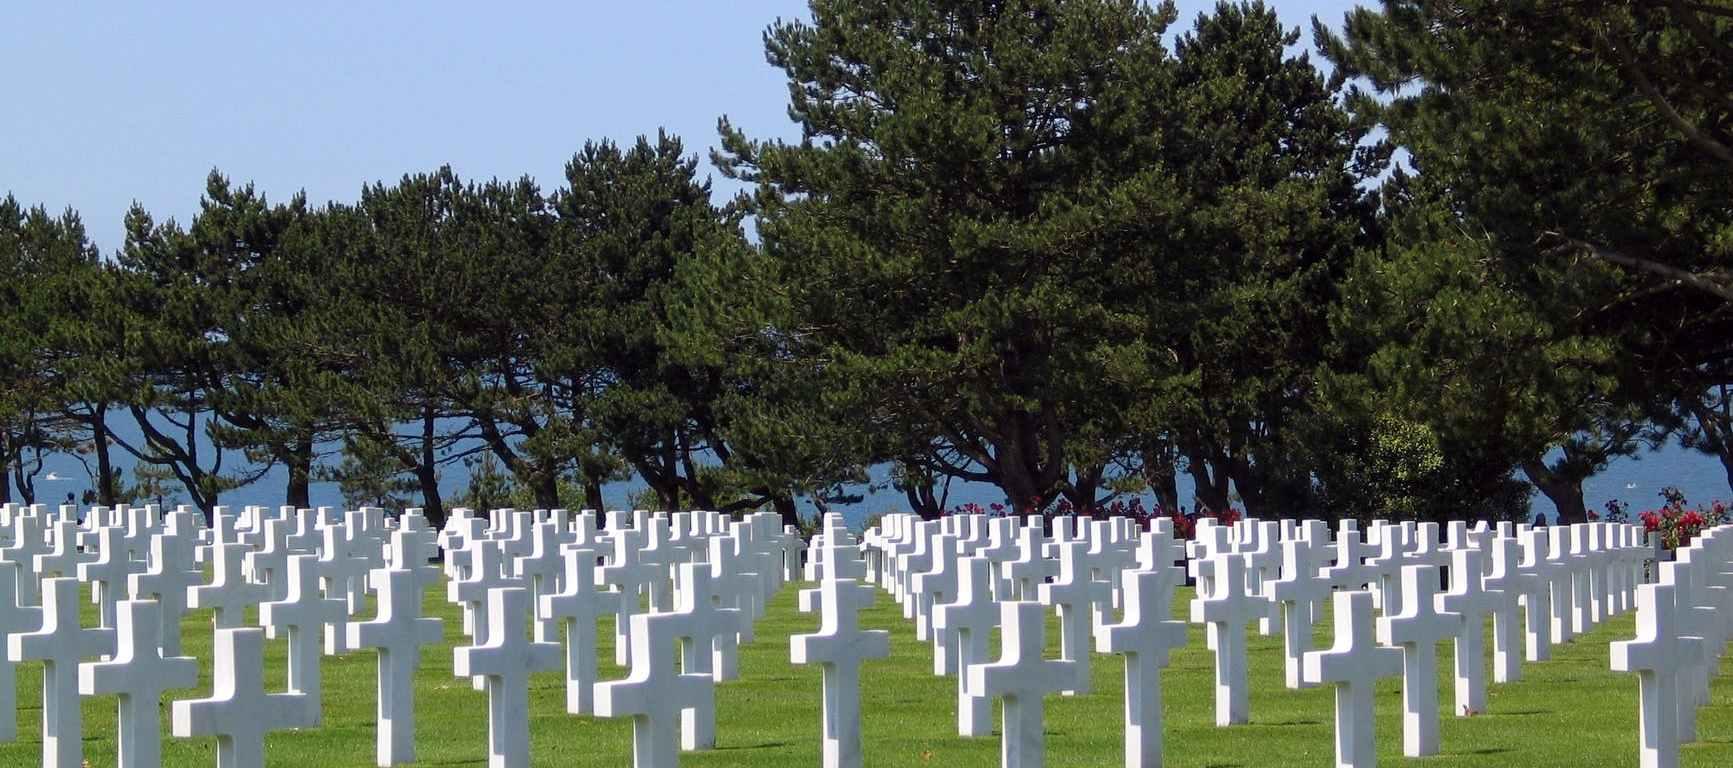 army burial cemetery cross